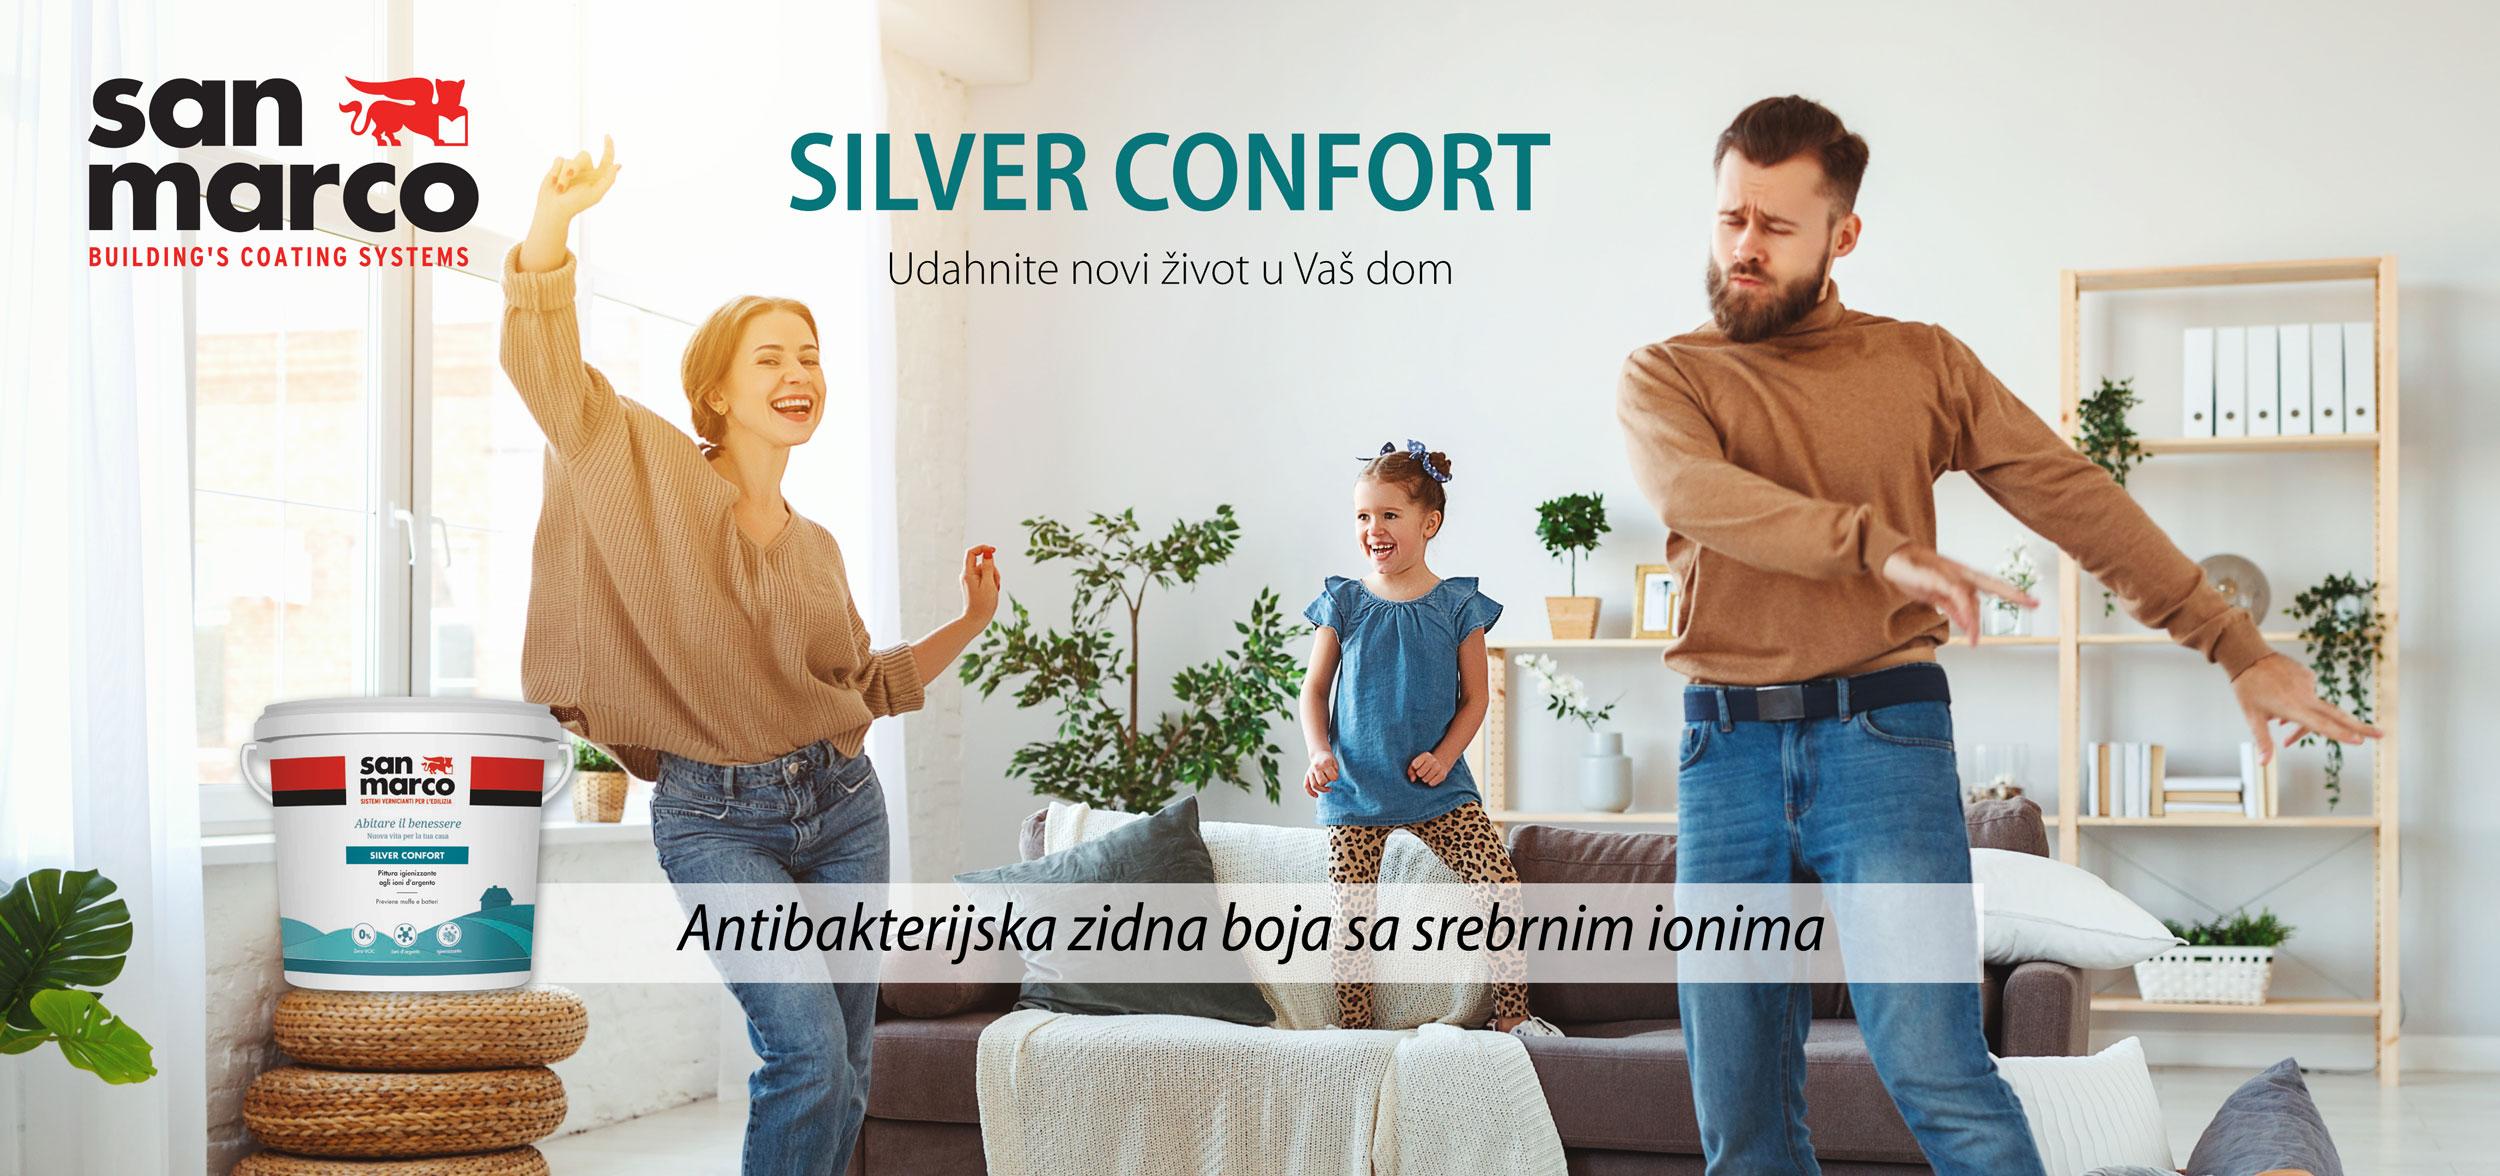 silverconfort antibakterijska boja